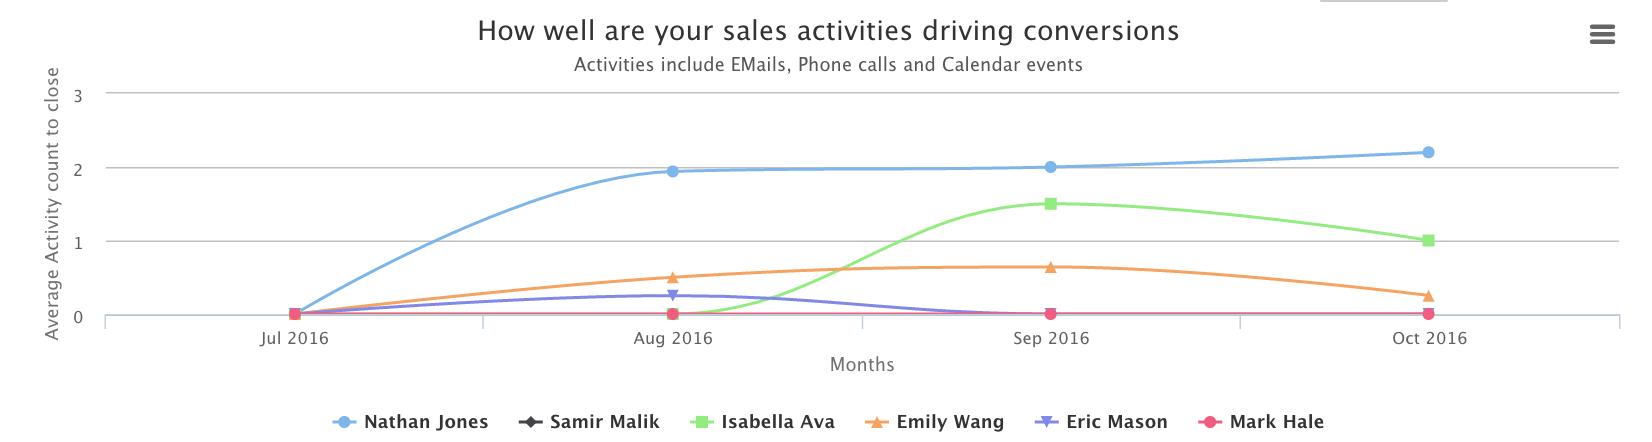 activity_efficiency_chart